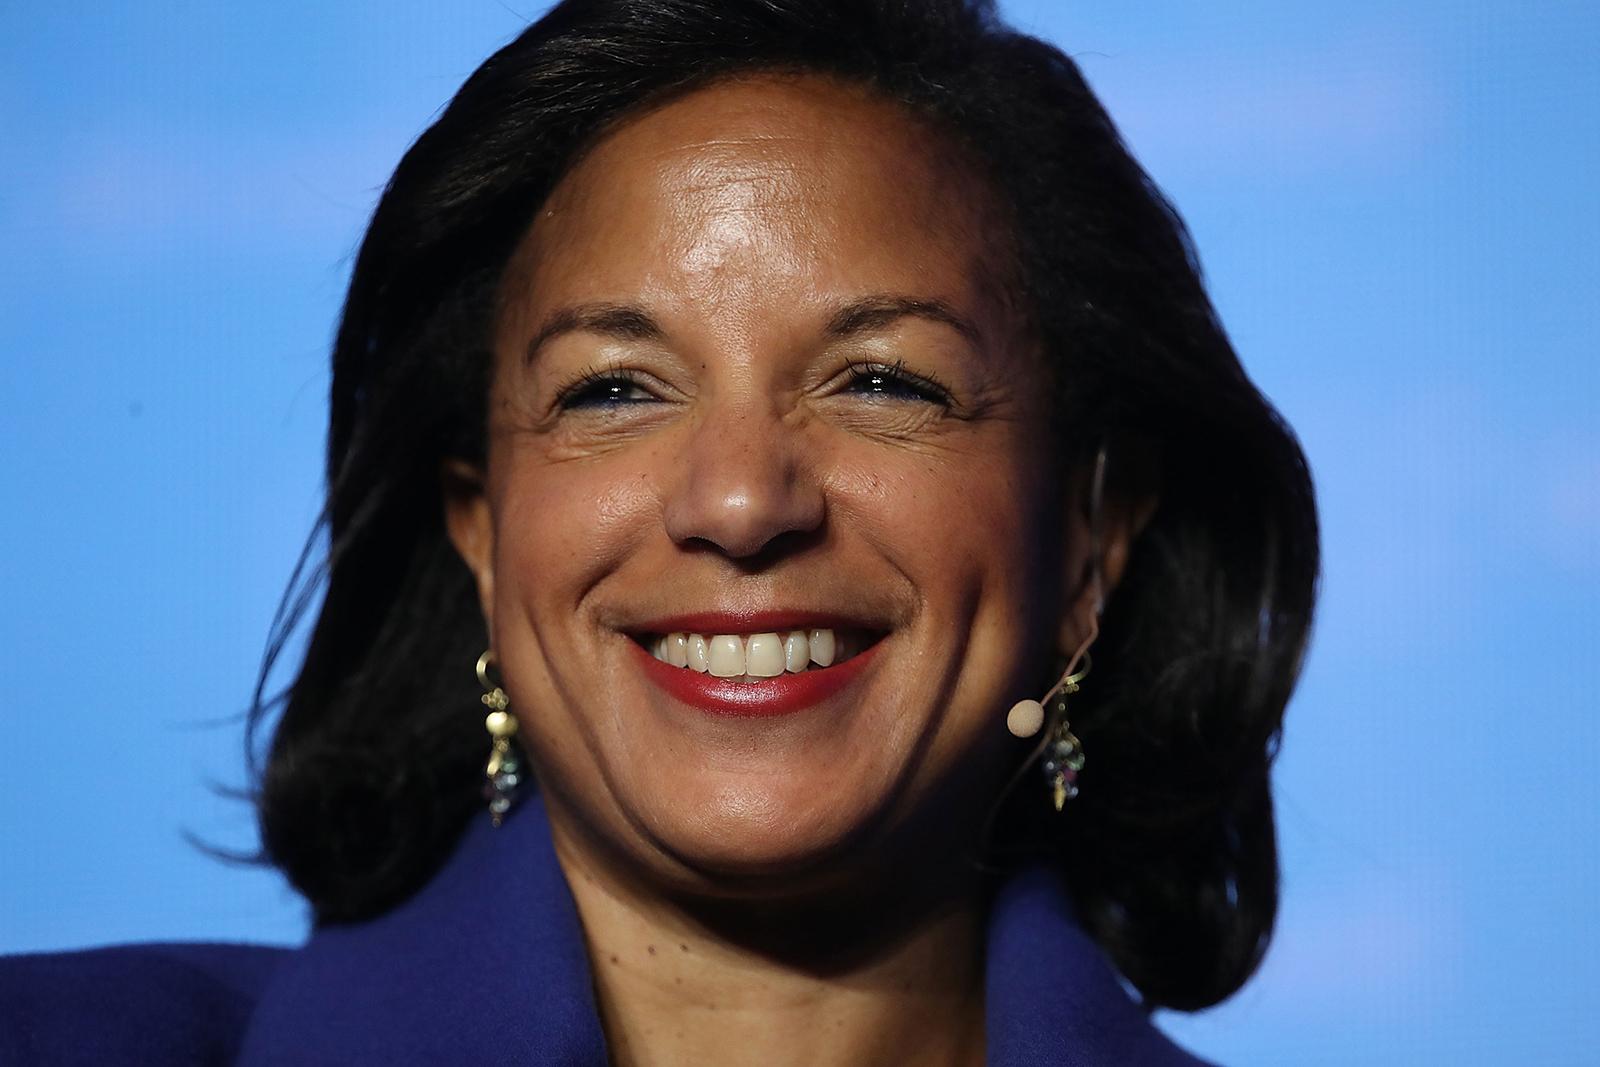 Former National Security Advisor Susan Rice speaks at the J Street 2018 National Conference April 16, 2018 in Washington, DC.